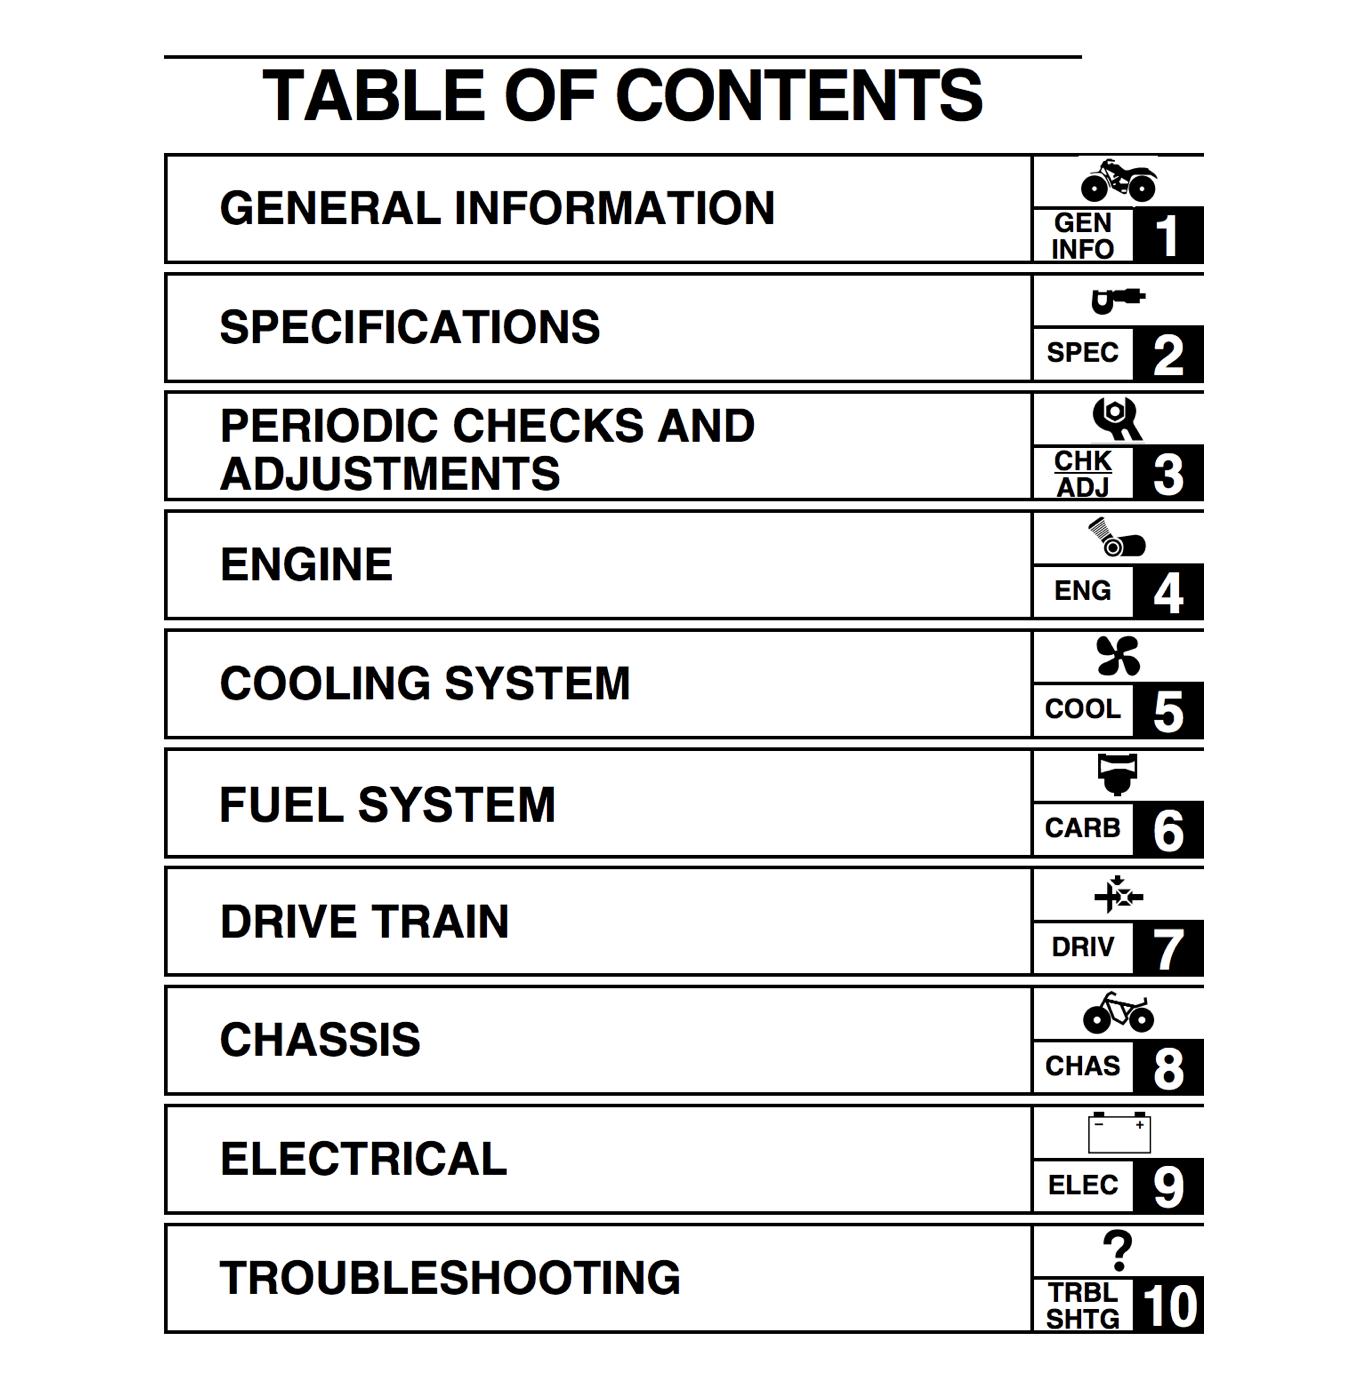 polaris sportsman 700 service manual chapters [ 1353 x 1377 Pixel ]